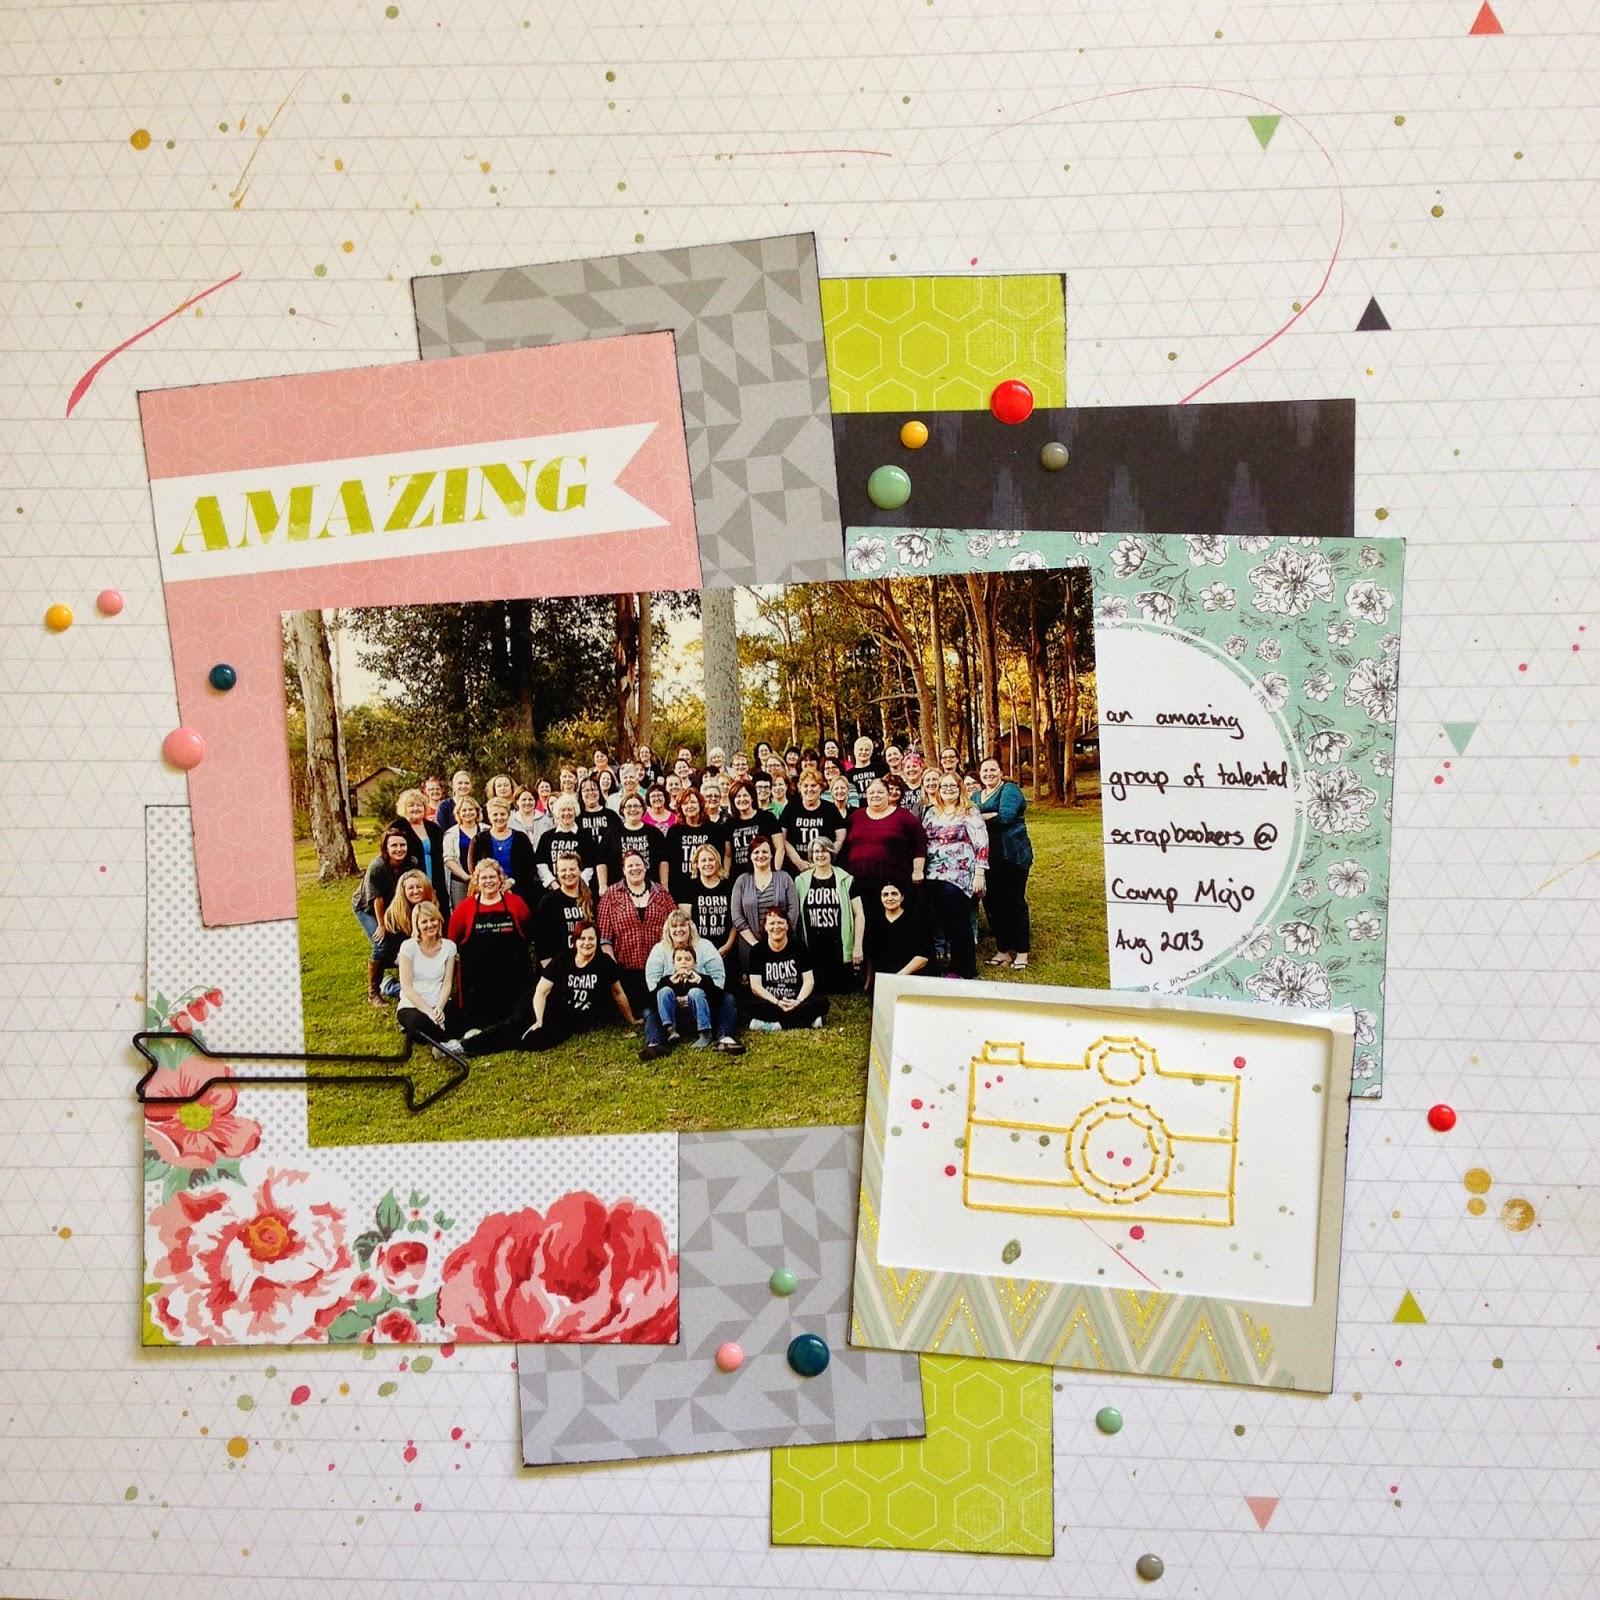 'Amazing' - Layout by Tracey Kinny for Dizzy Izzy Scrapbooking